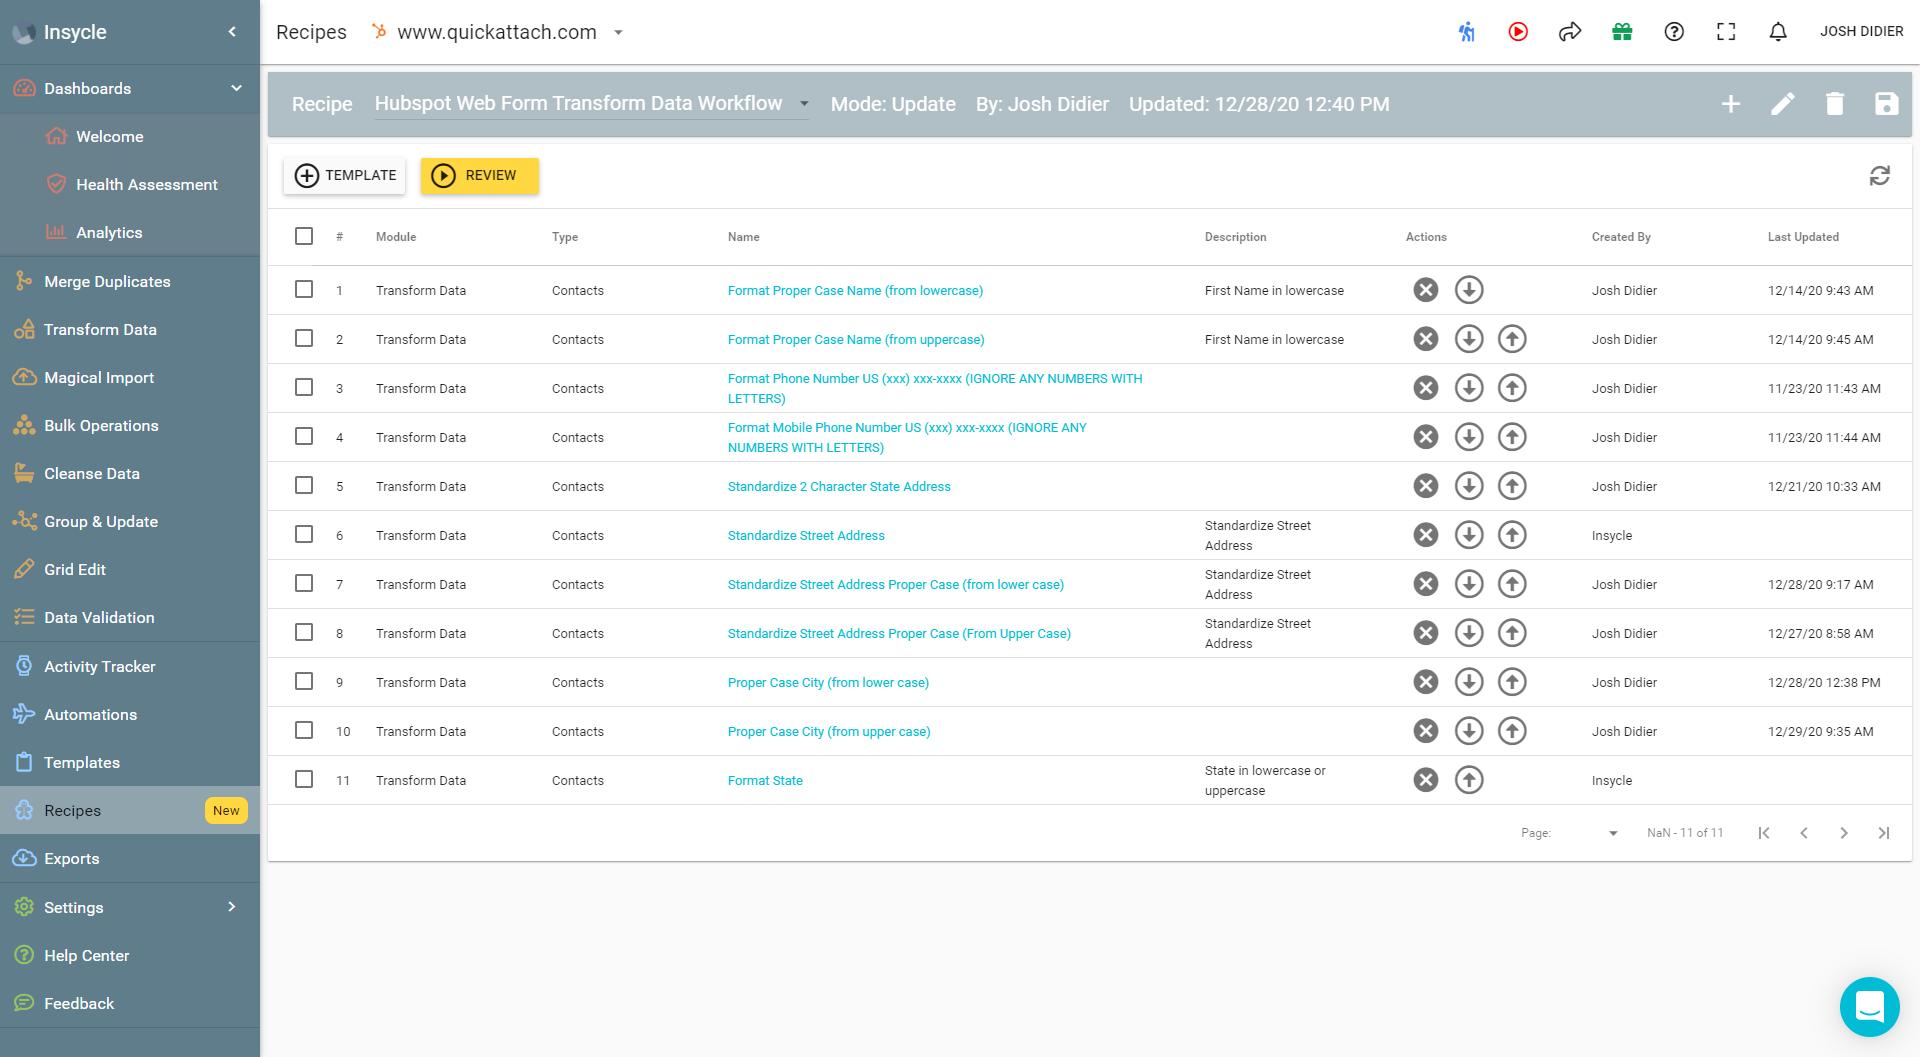 Quick Attach Recipe for HubSpot Workflow